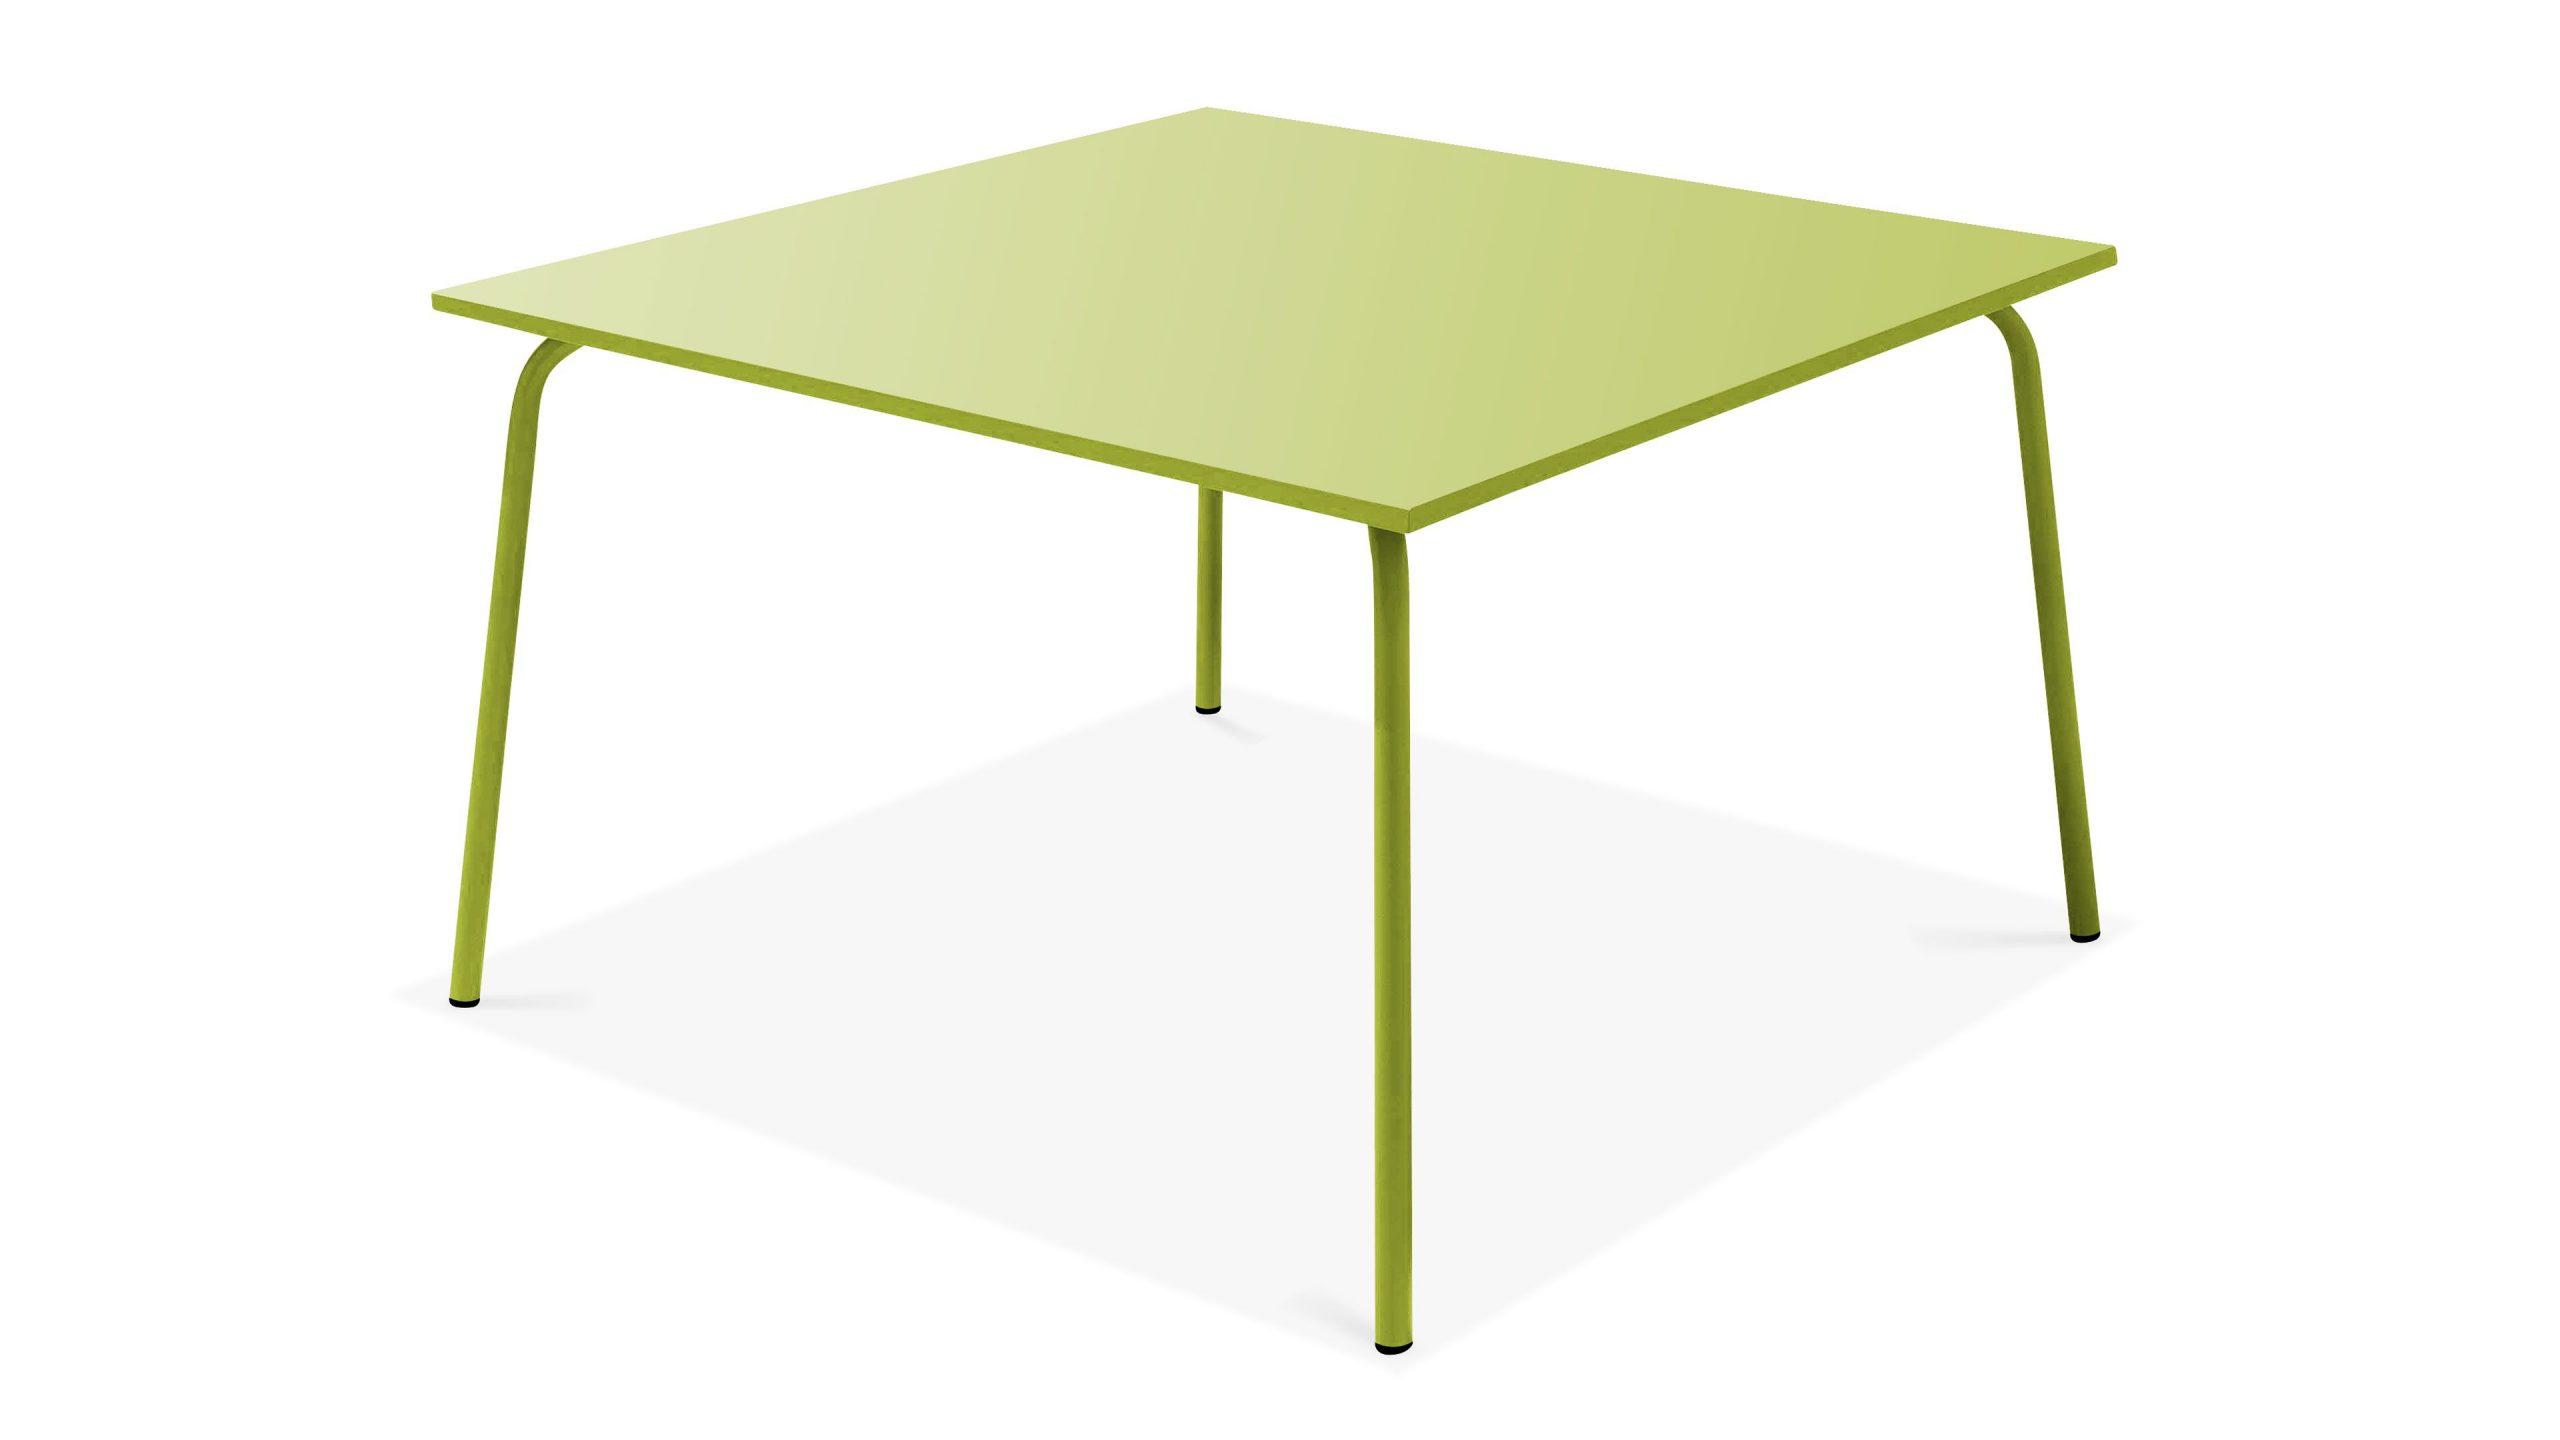 Table De Jardin Carrée En Acier 8 Places | Oviala pour Table De Jardin Carrée 8 Personnes